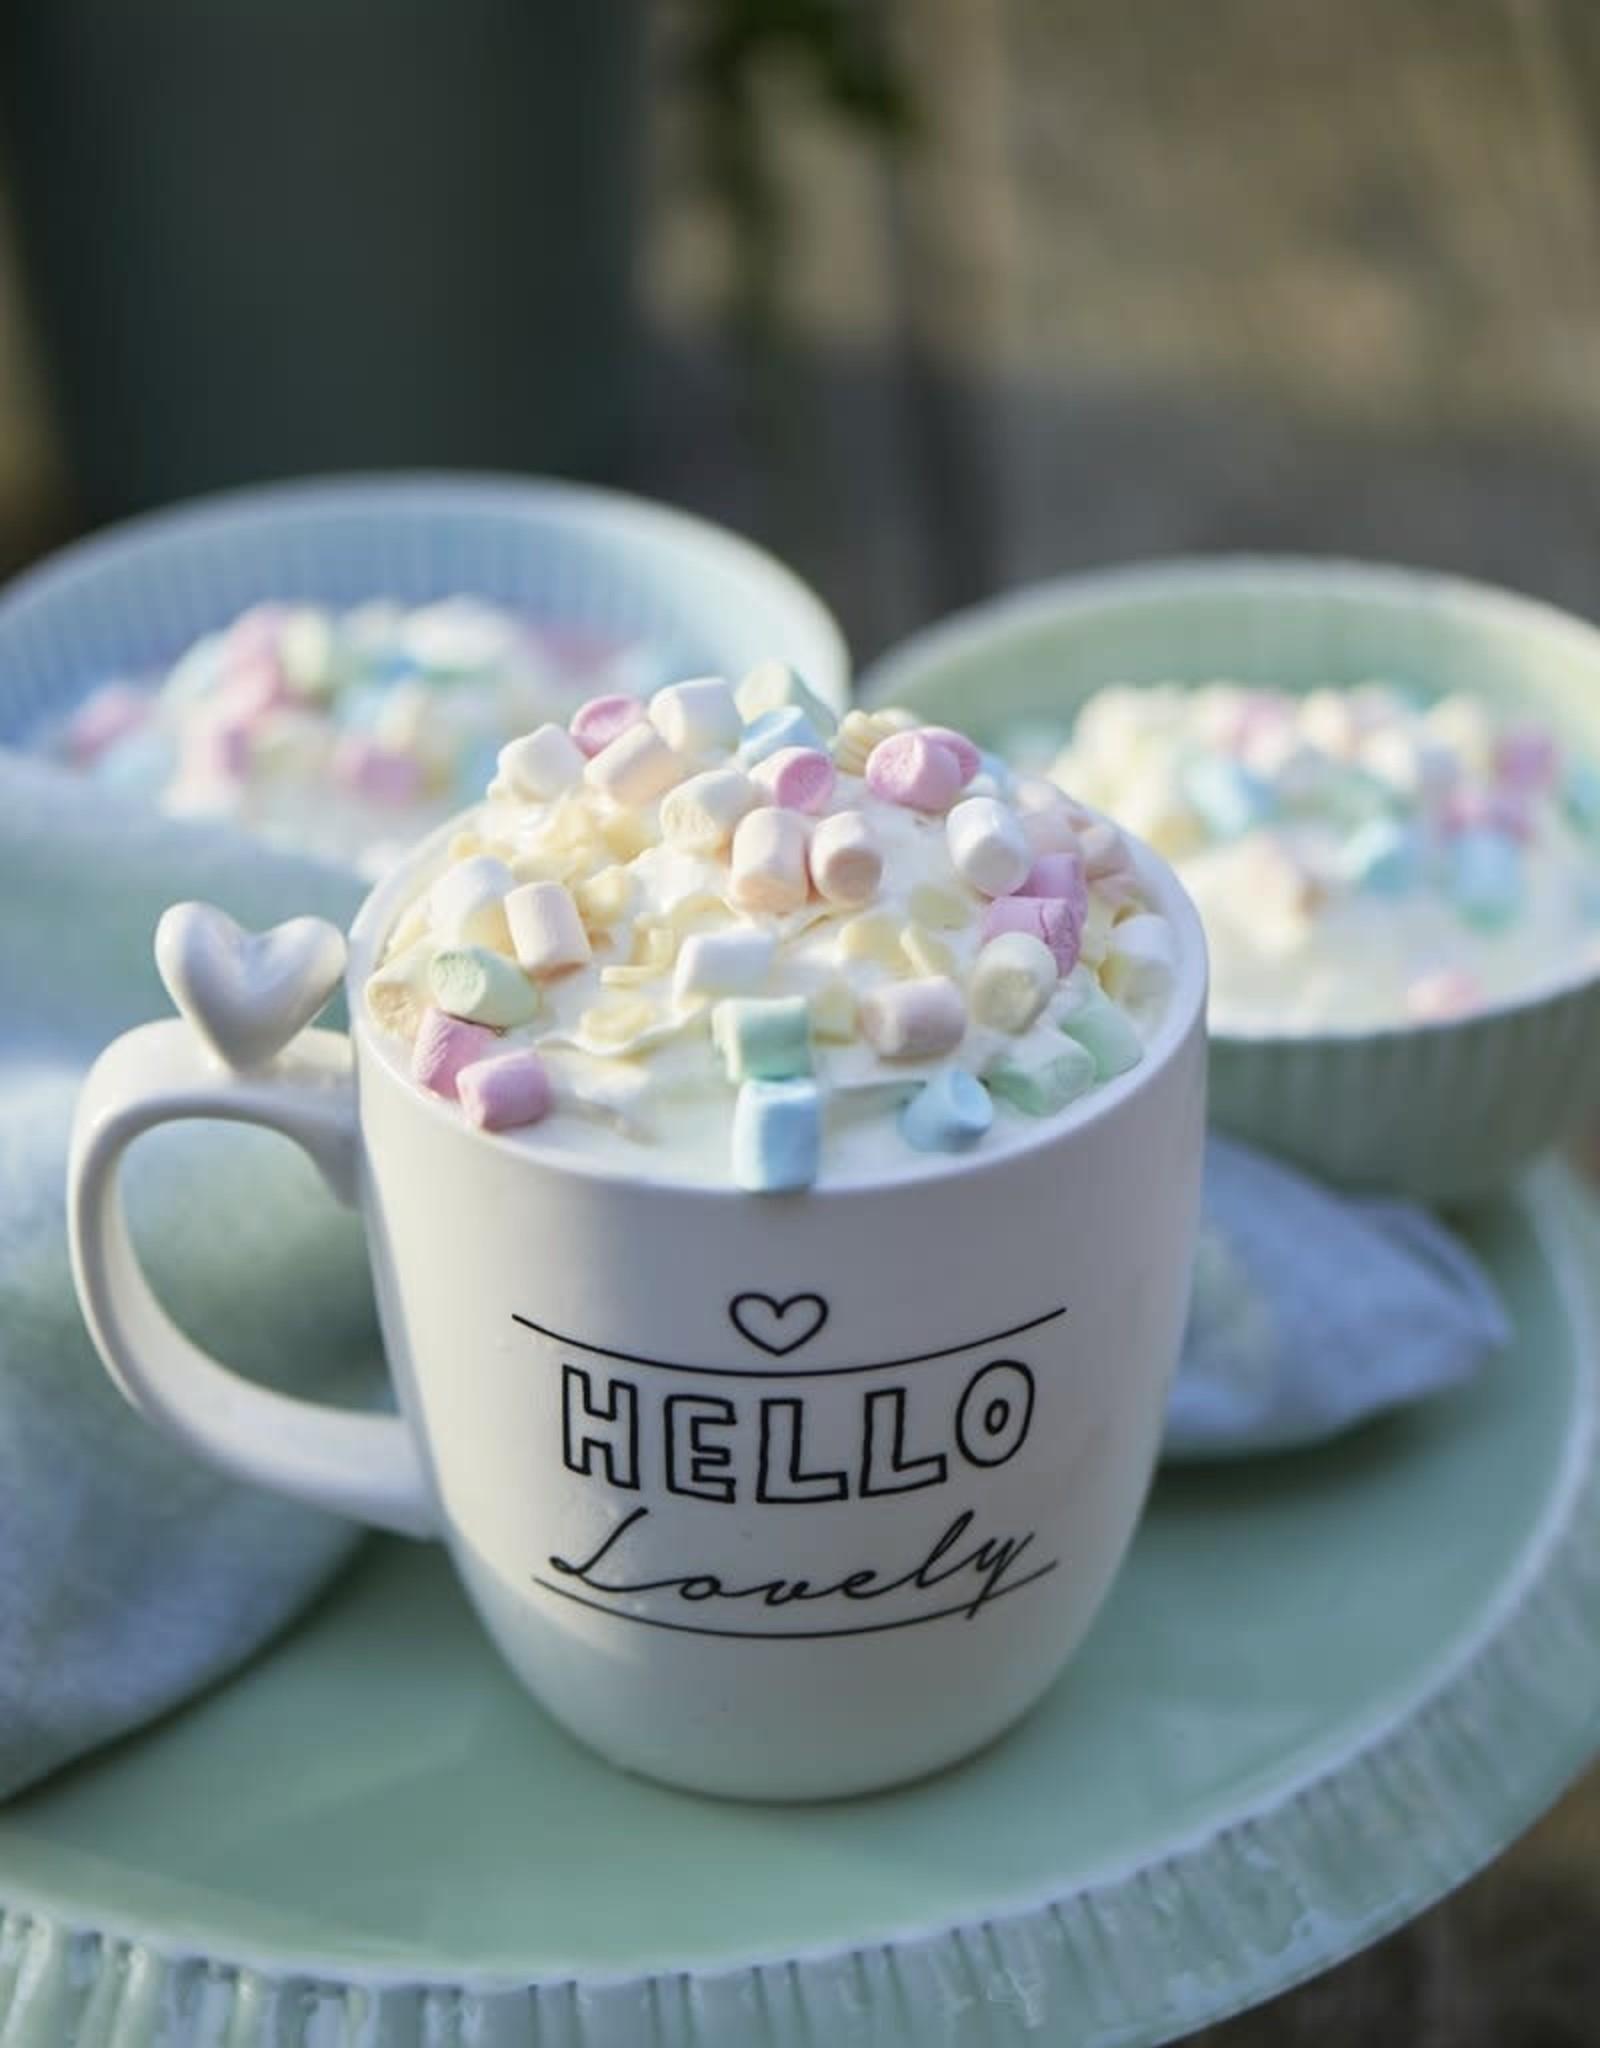 Rivièra Maison Hello Lovely Mug